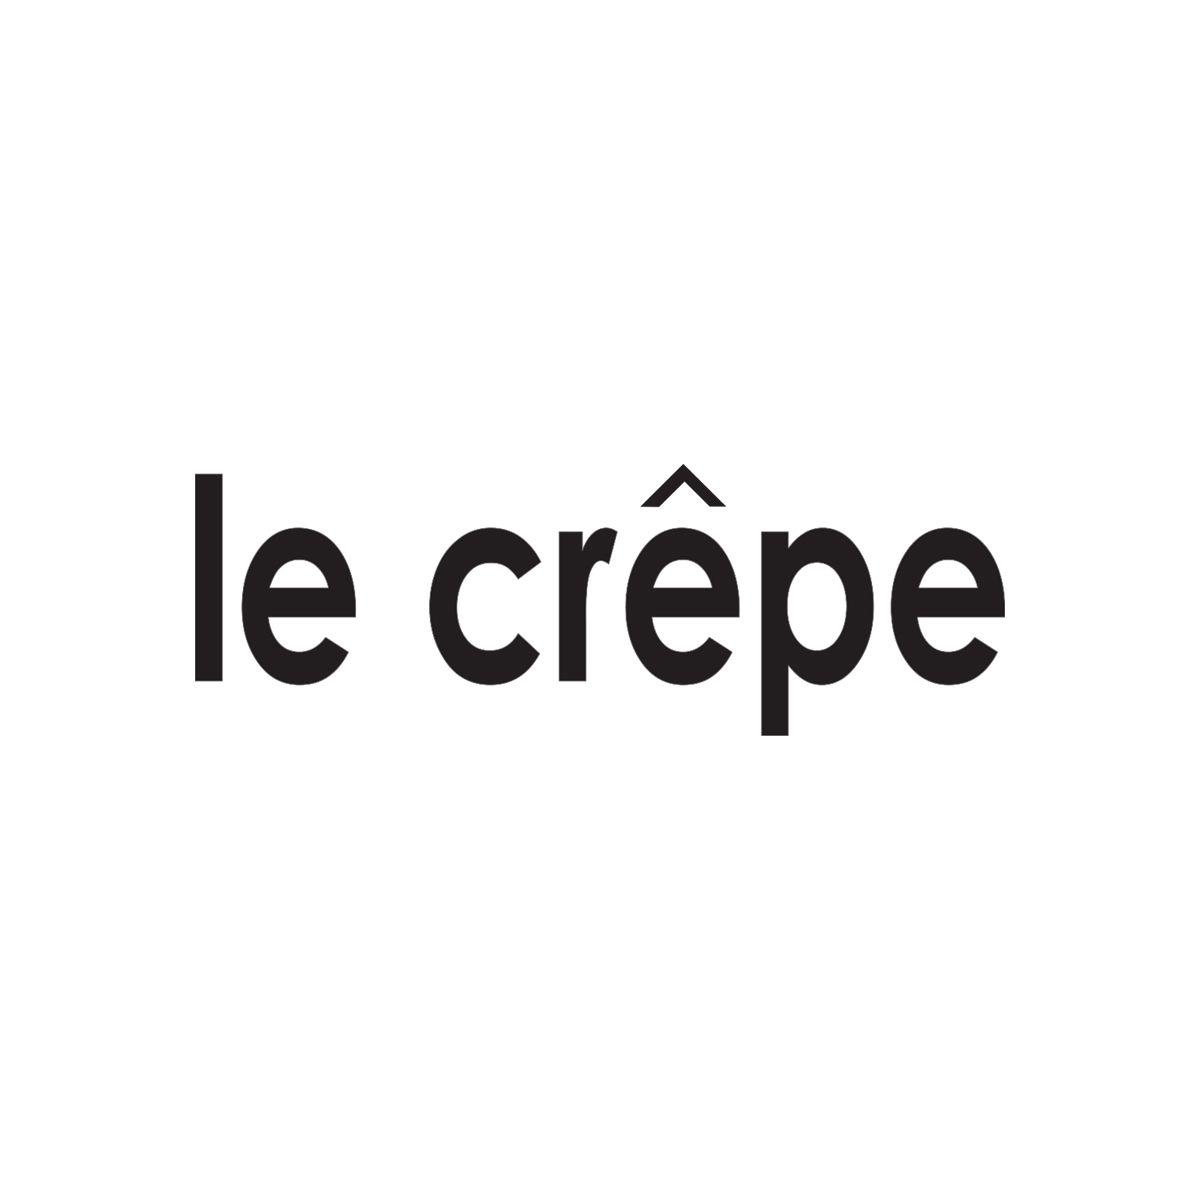 LeCrepe-TOL-2019